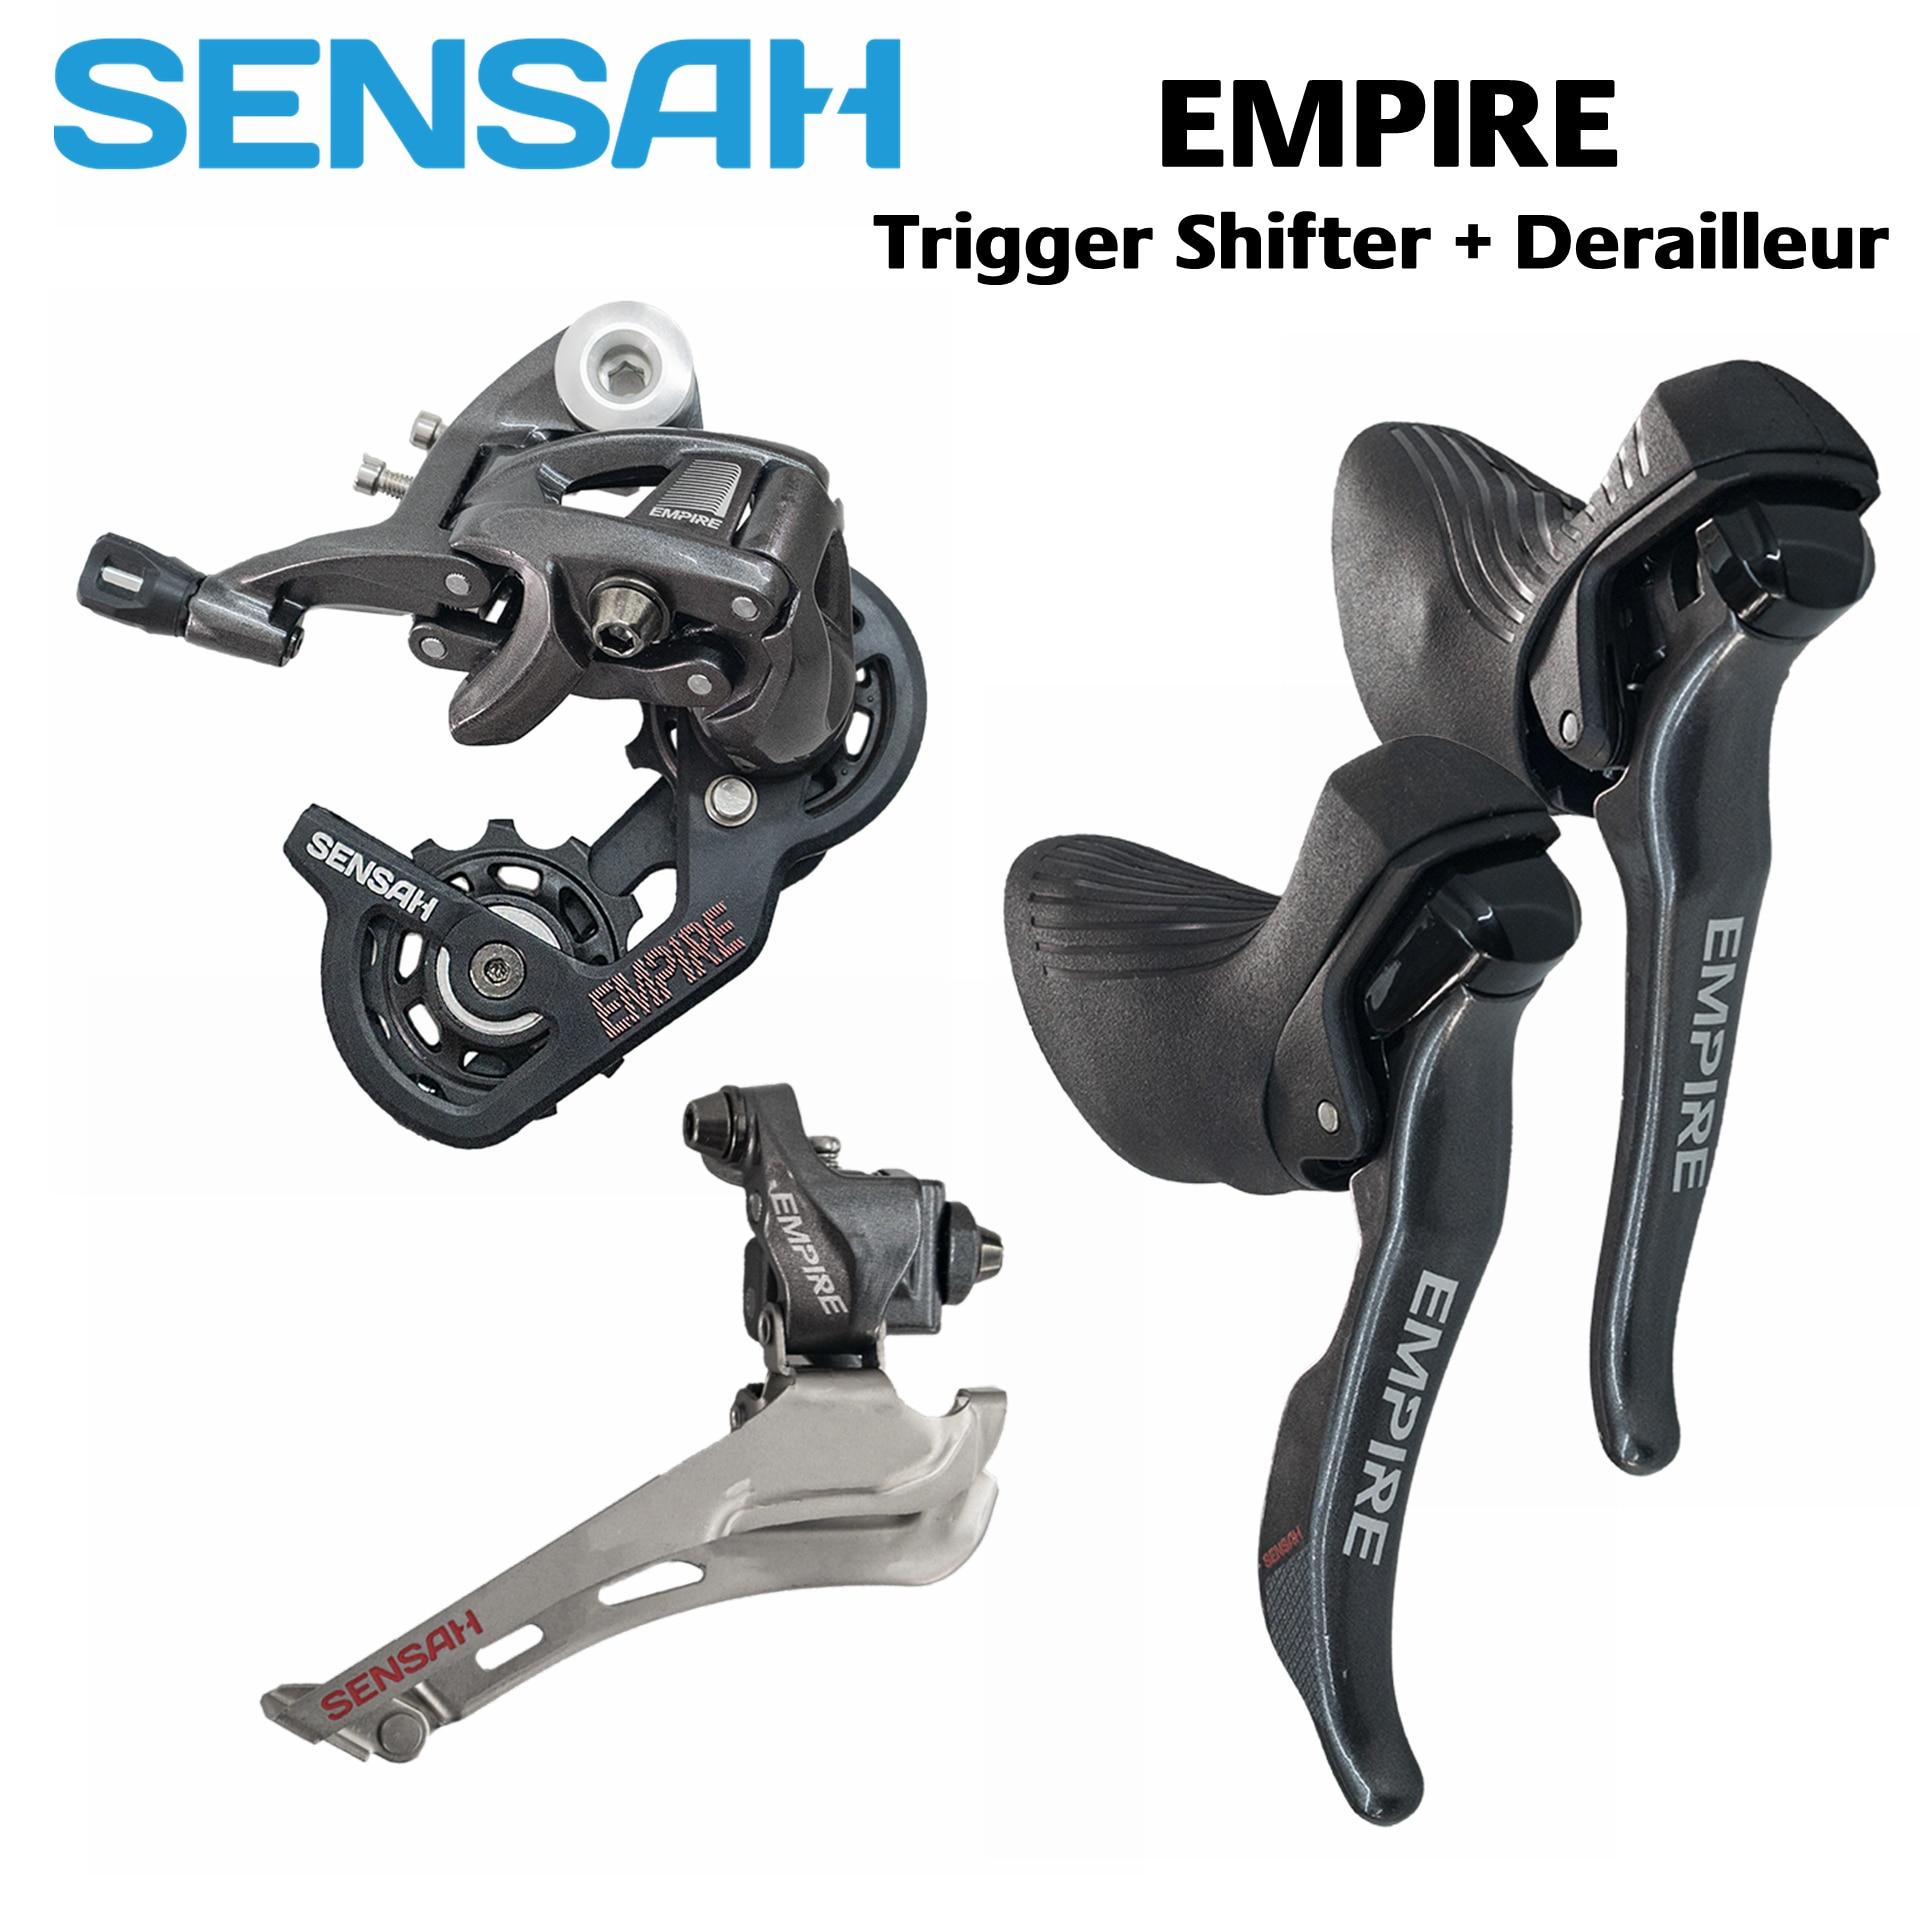 SENSAH групset SENSAH EMPIRE 2x11 Speed, 22s Road Groupset, переключатель передач + задние переключатели + передние переключатели, красный, force, Rival